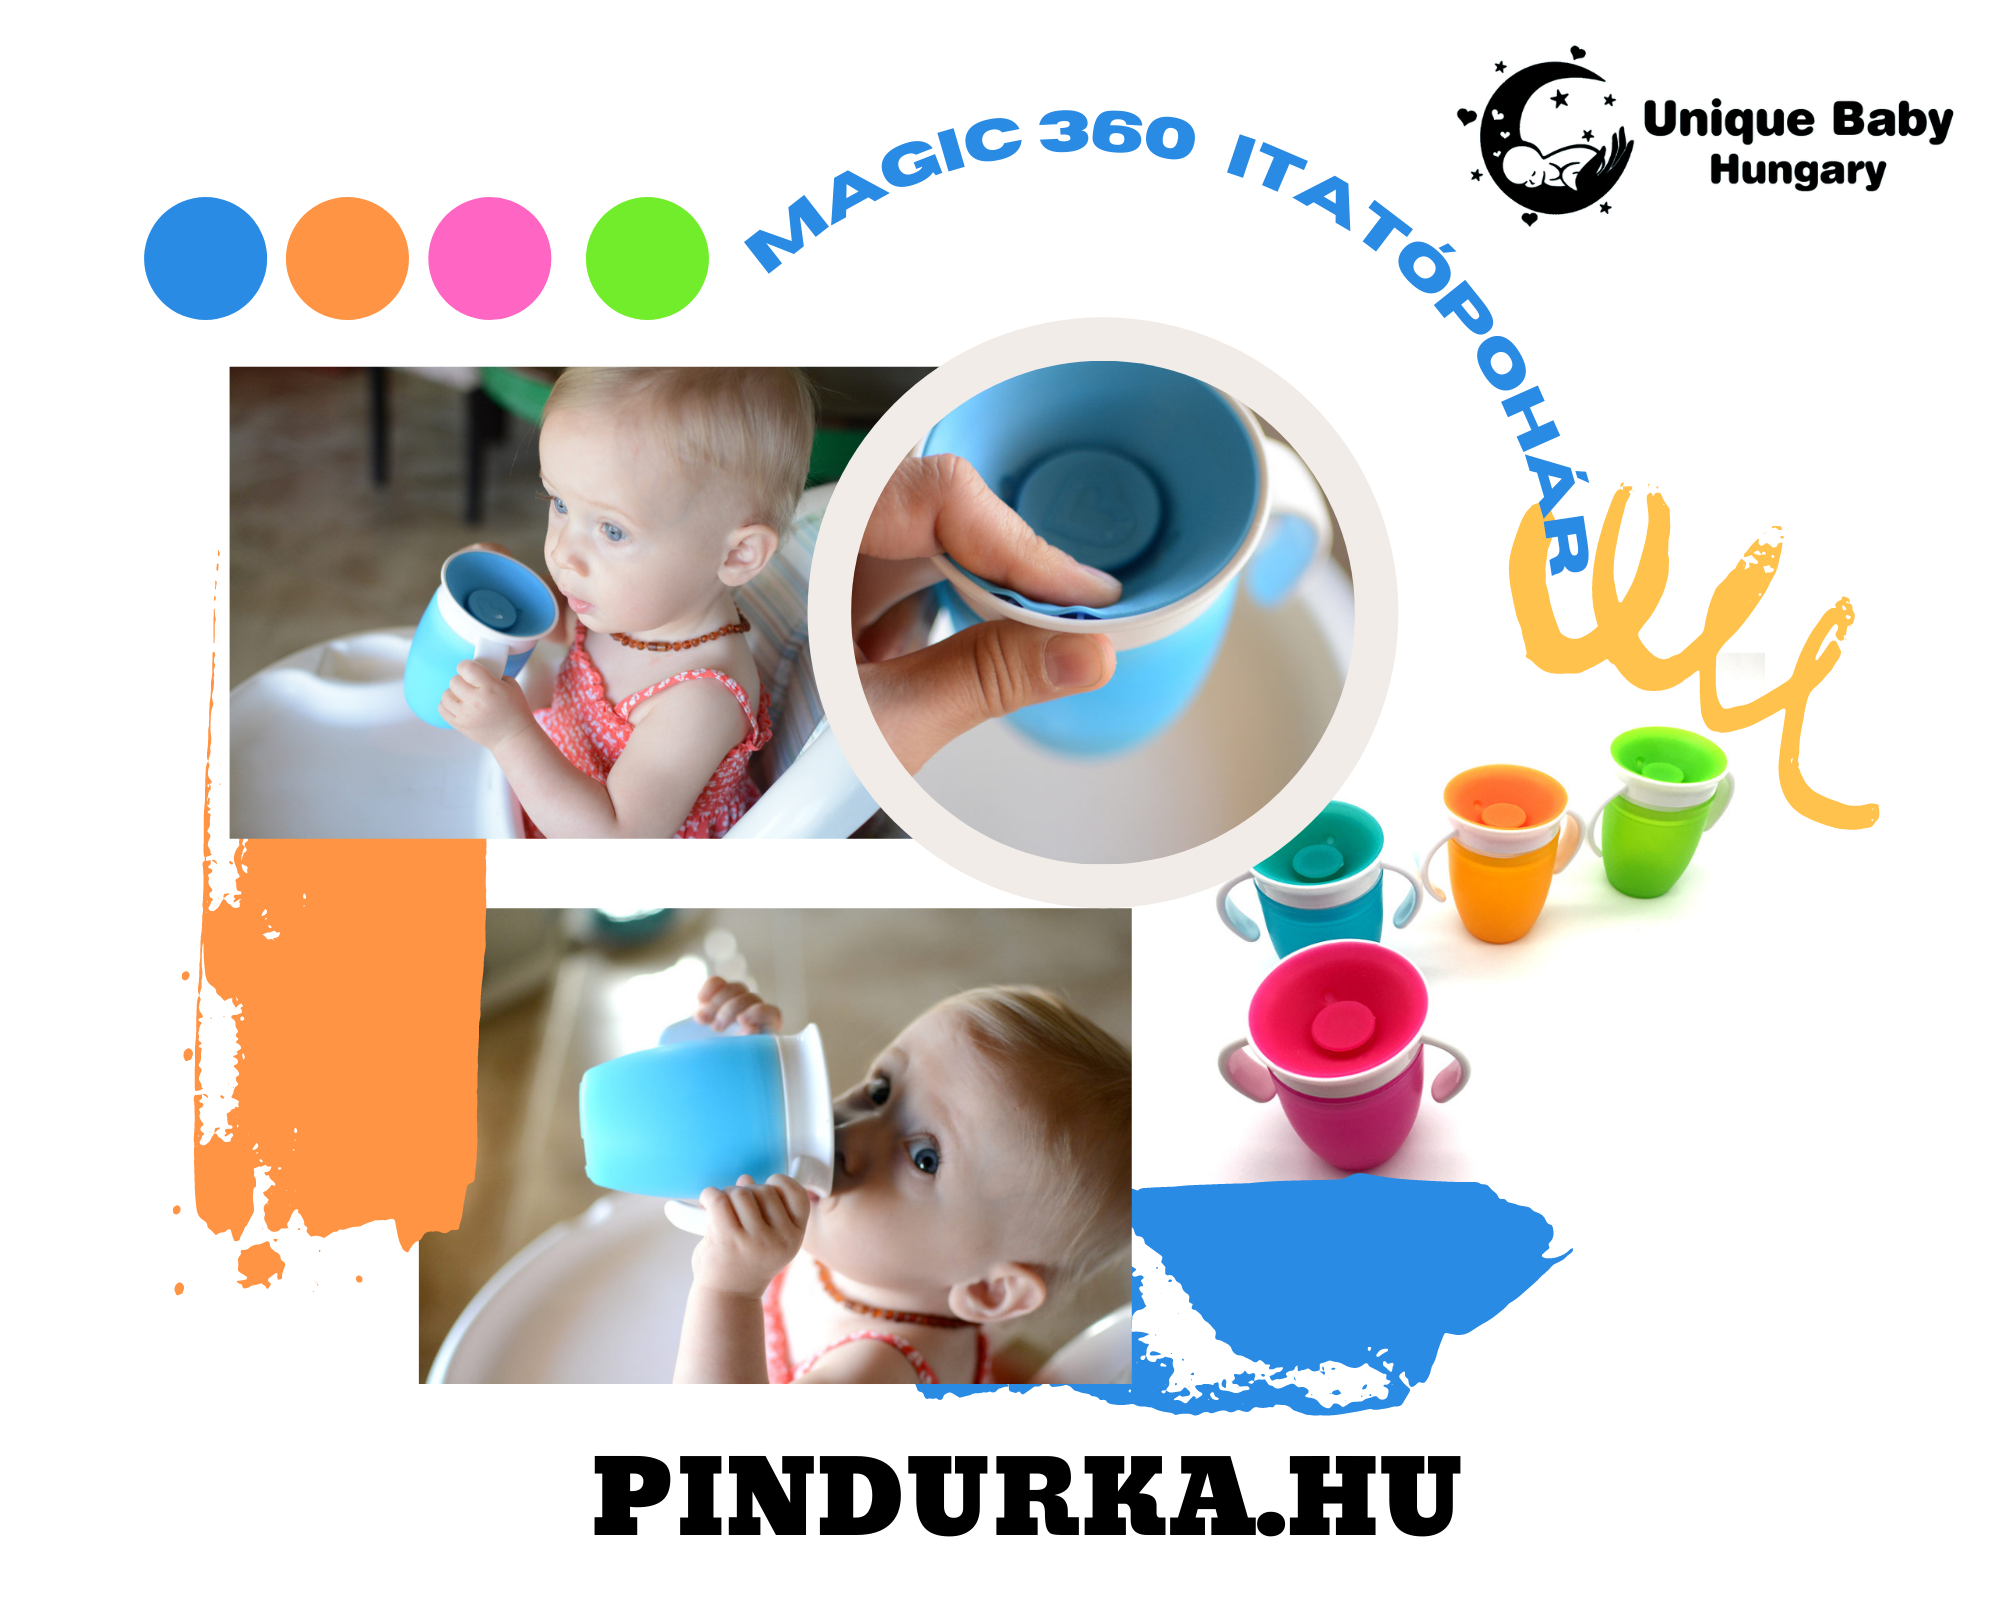 Unique Baby Magic 360 Itatópohár